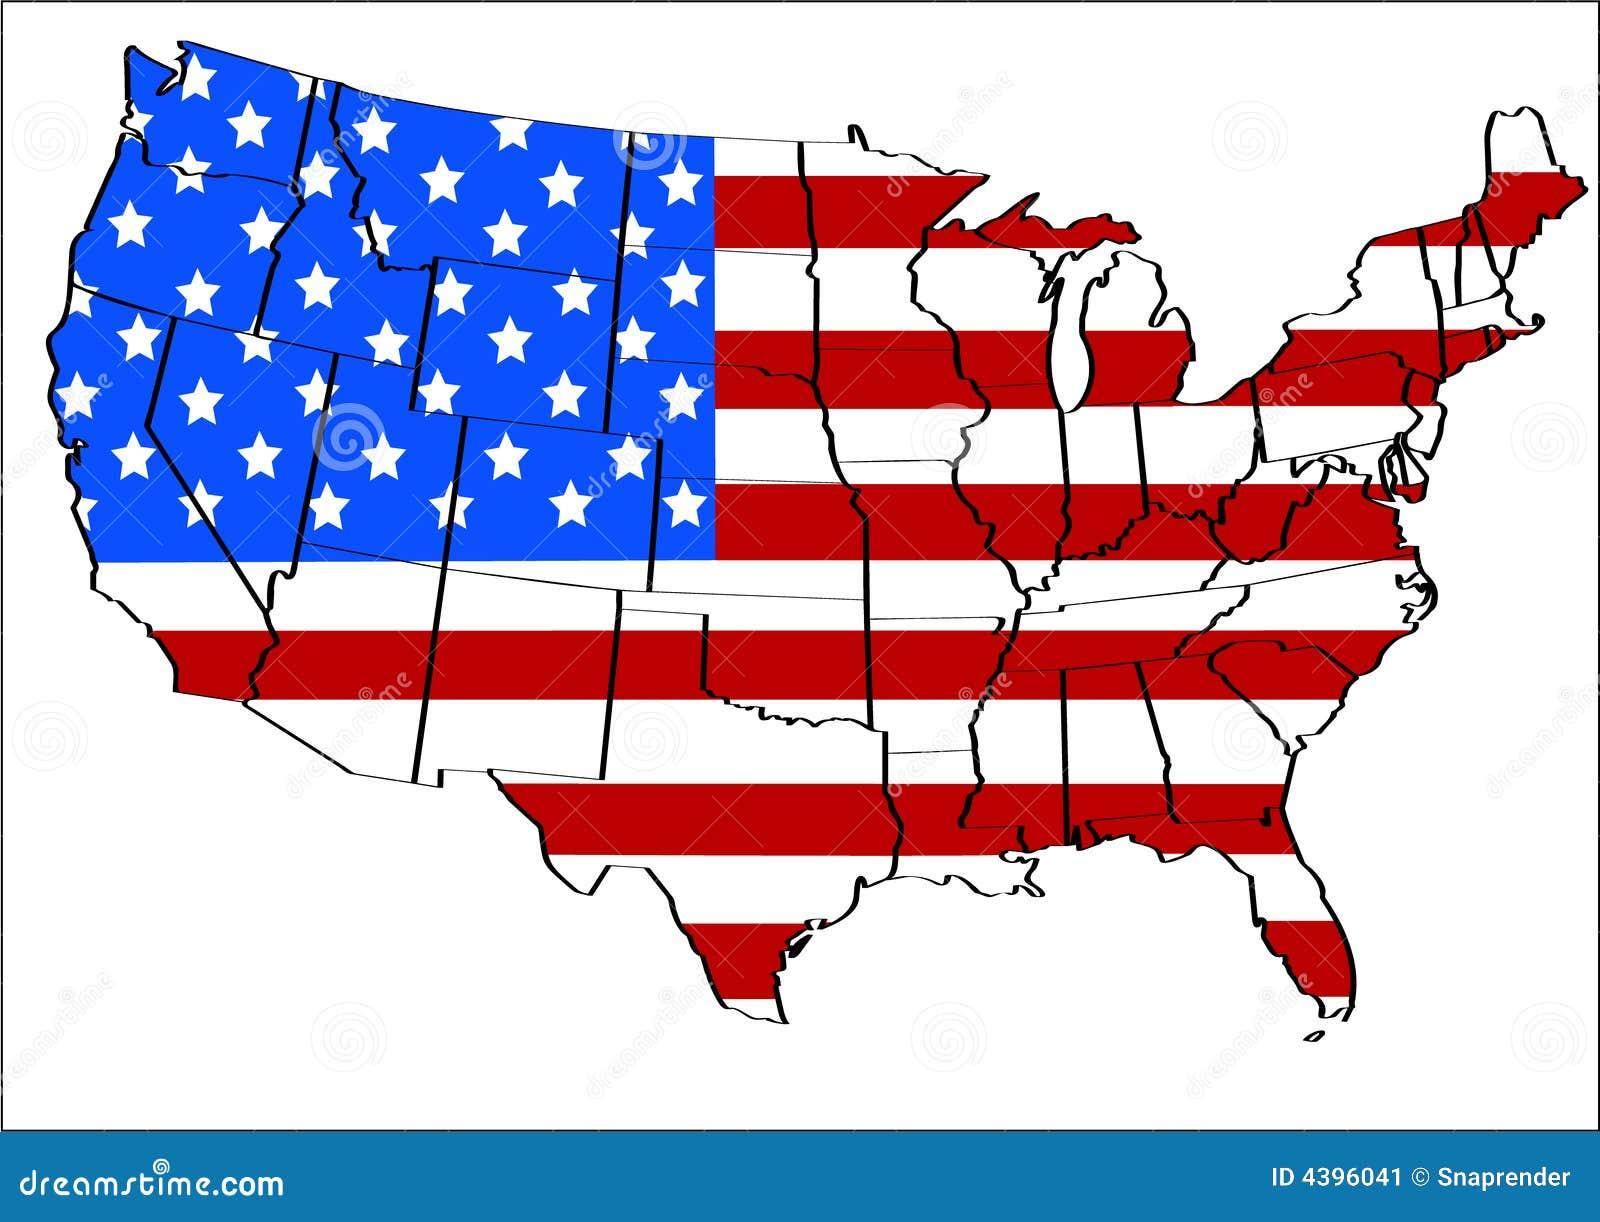 Uk Us Map Overlay Globalinterco - Procedural map rust rusttopia us